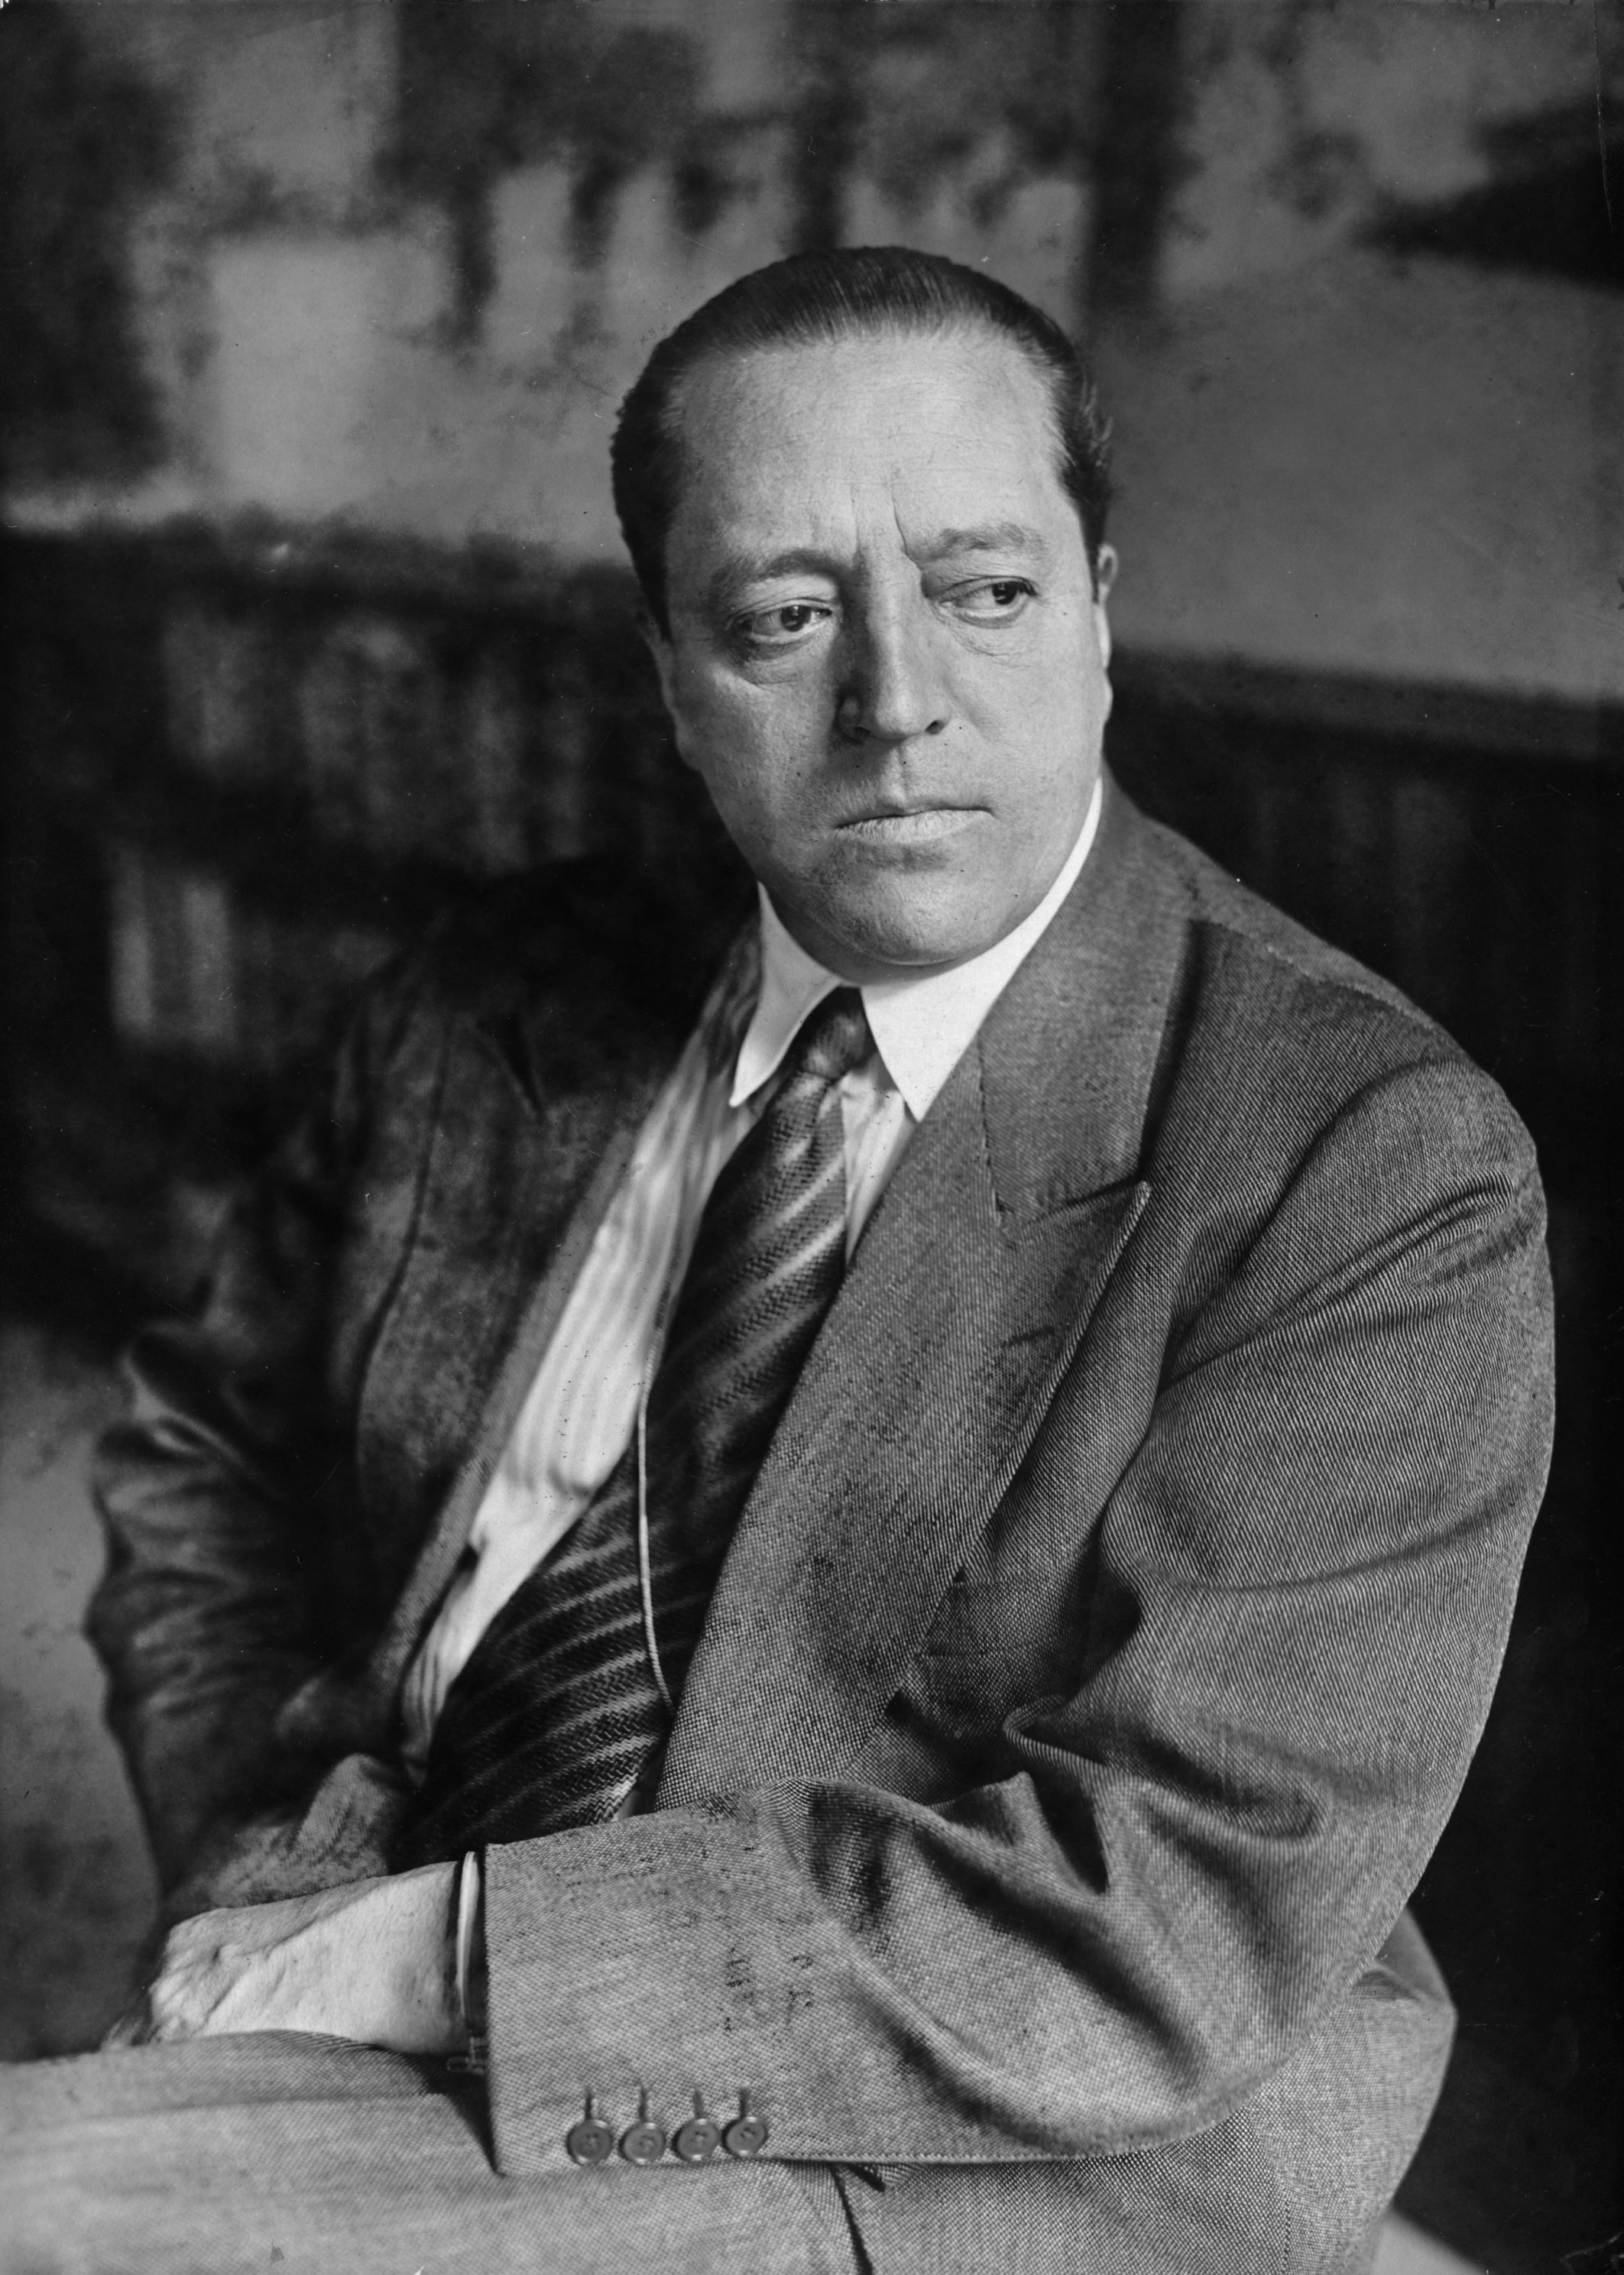 Fotograf: Willy Römer ab 1930-1933 Direktor des Bauhauses in Dessau Aufnahmedatum: 1931 Aufnahmeort: Berlin Objektmaß 13x18 cm Inventar-Nr.: WR_ON0026